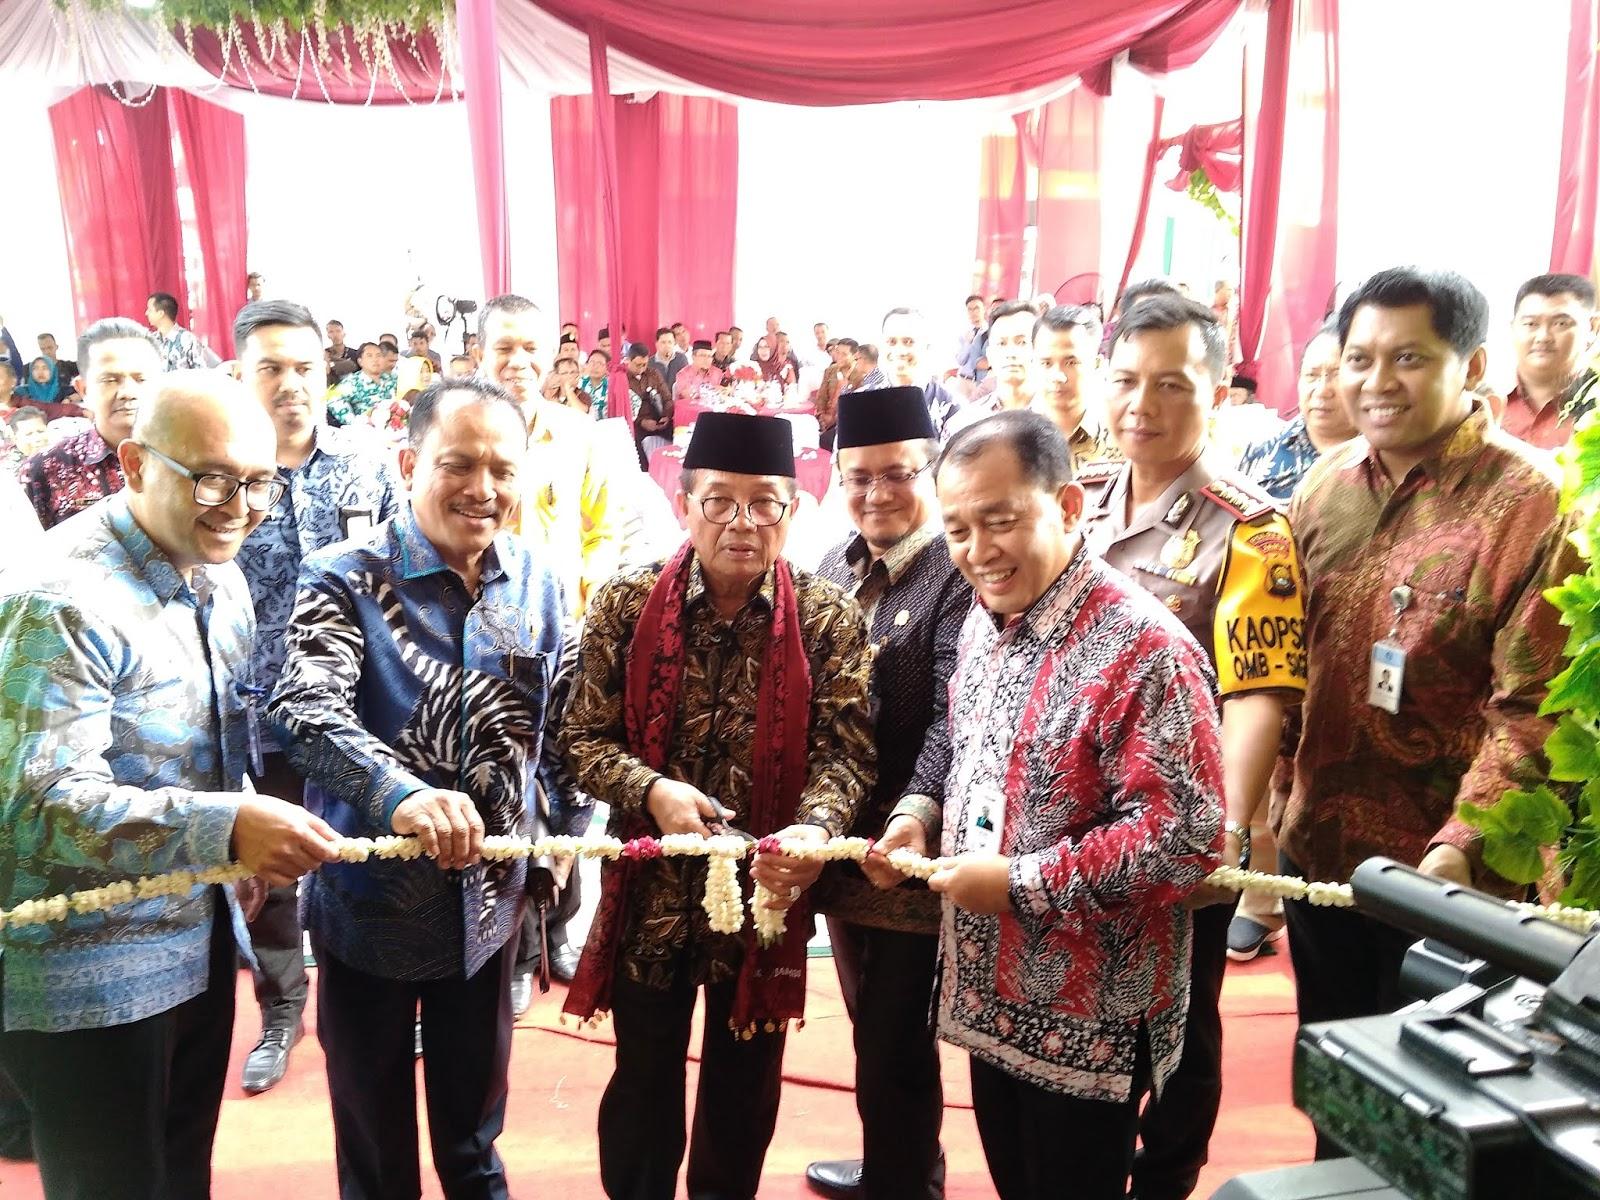 Plt Gubernur Jambi Meresmikan KCP Bank Jambi Pasar Angso Duo.